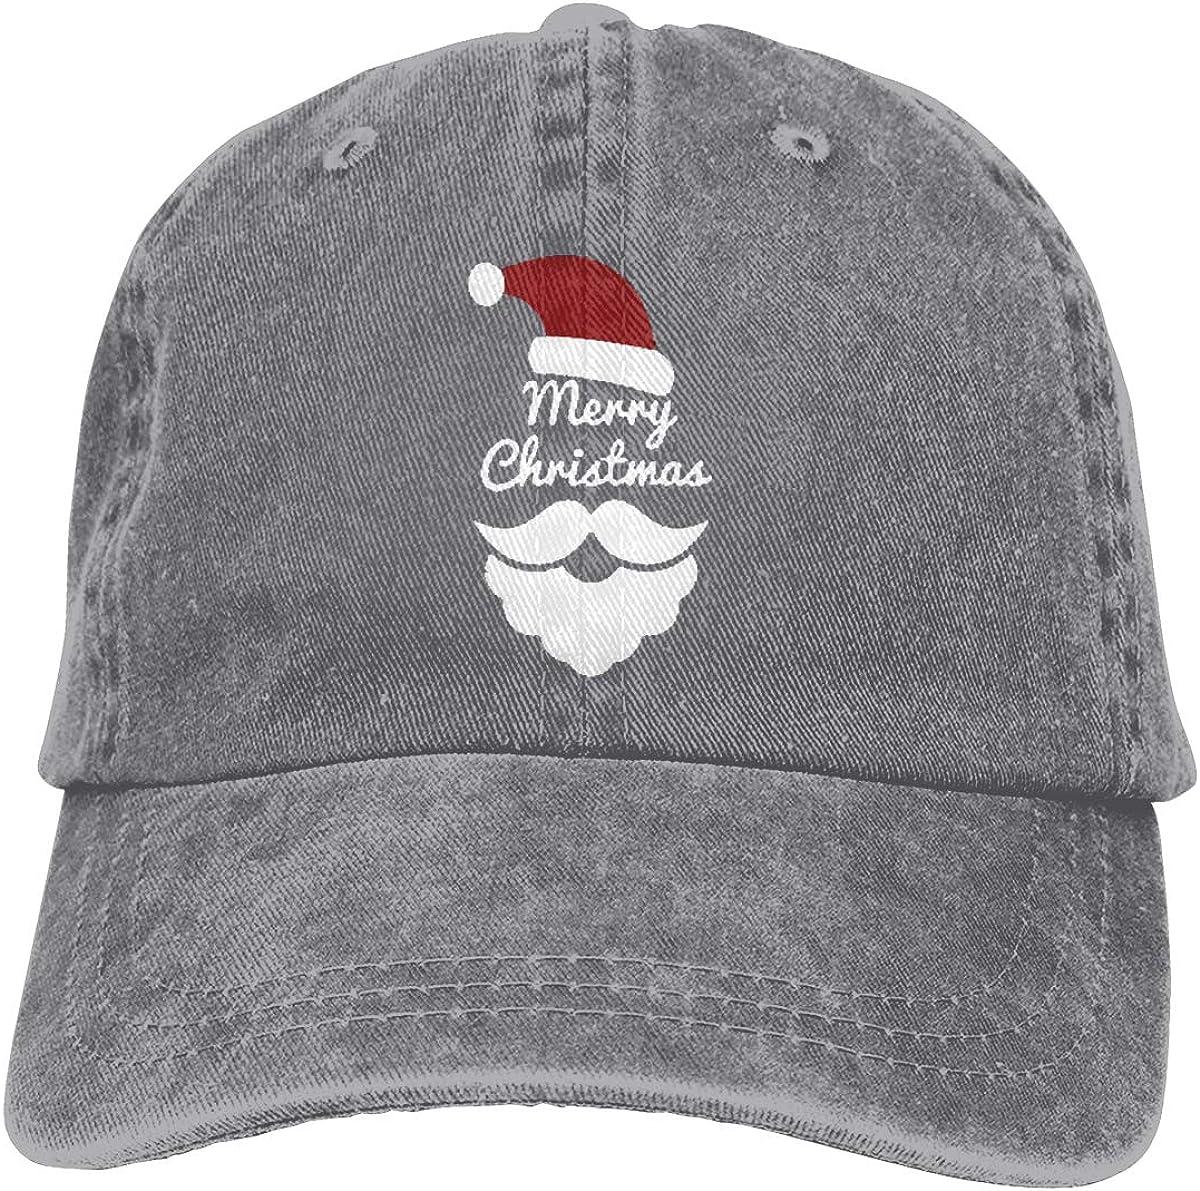 Merry Christmas Hat Men Women Vintage Jeans Trucker Hat Gray